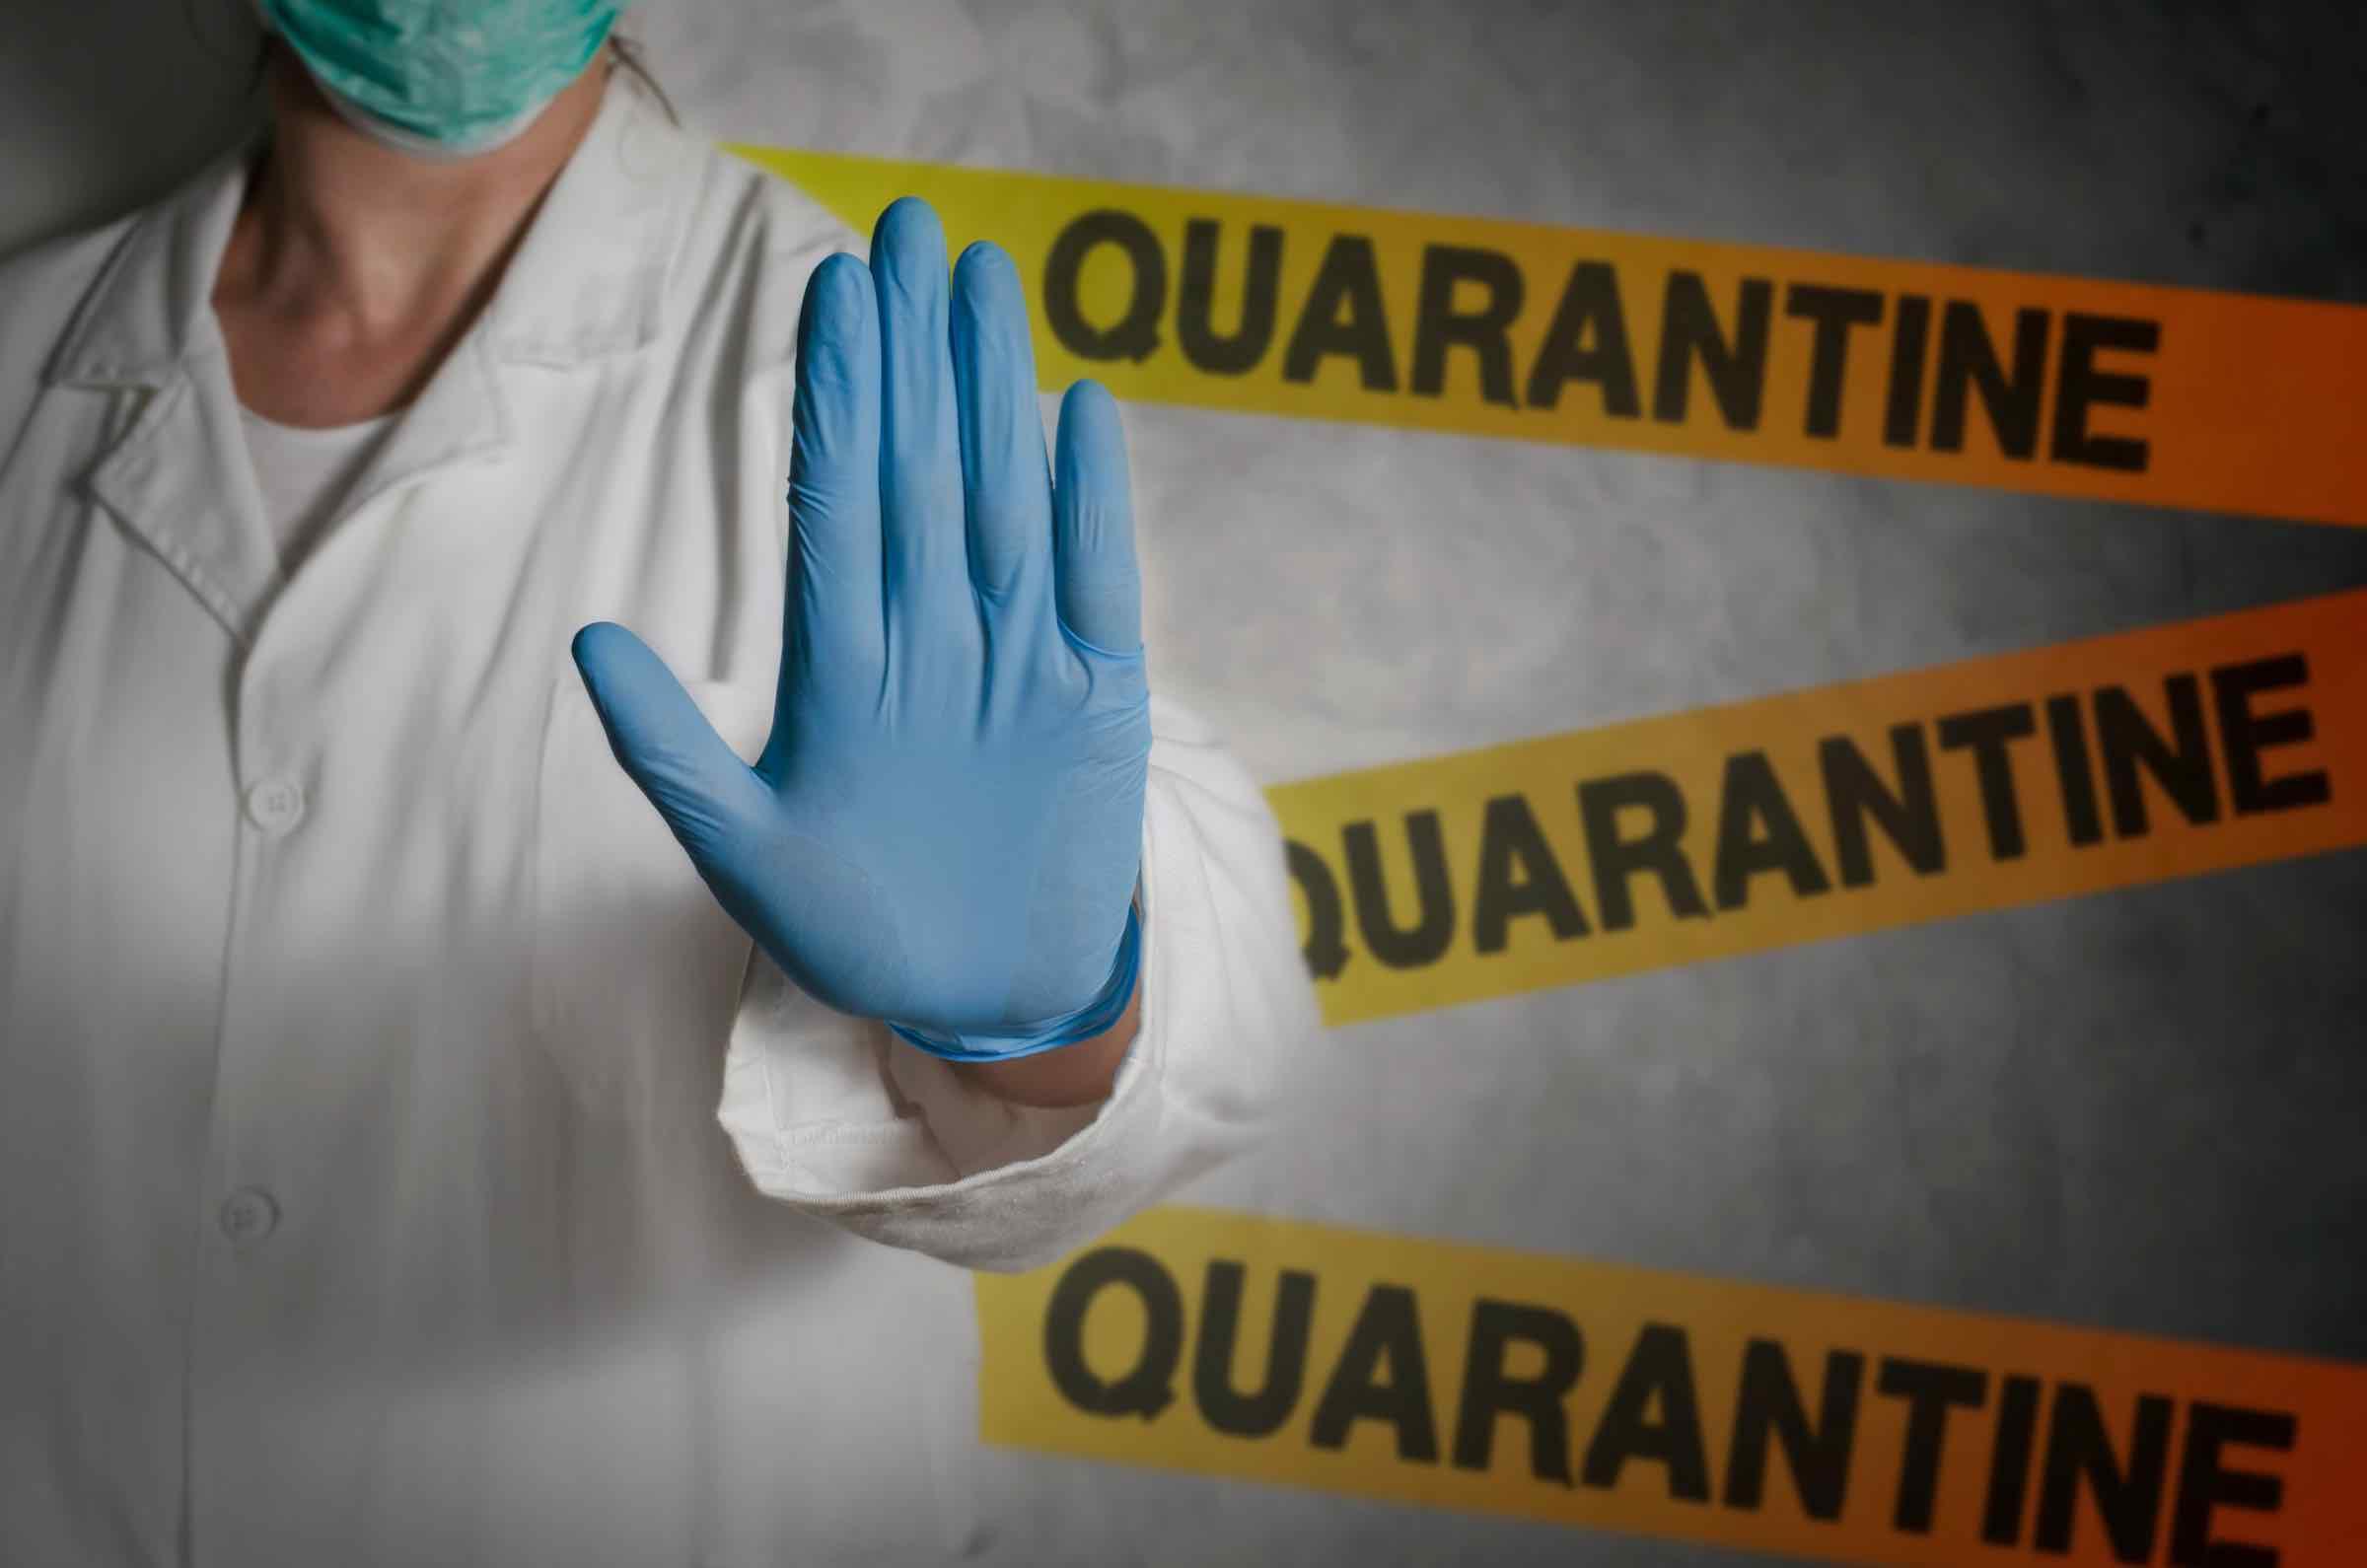 The Best Quarantine Memes Explained By Quarantine Meme Houses Vox